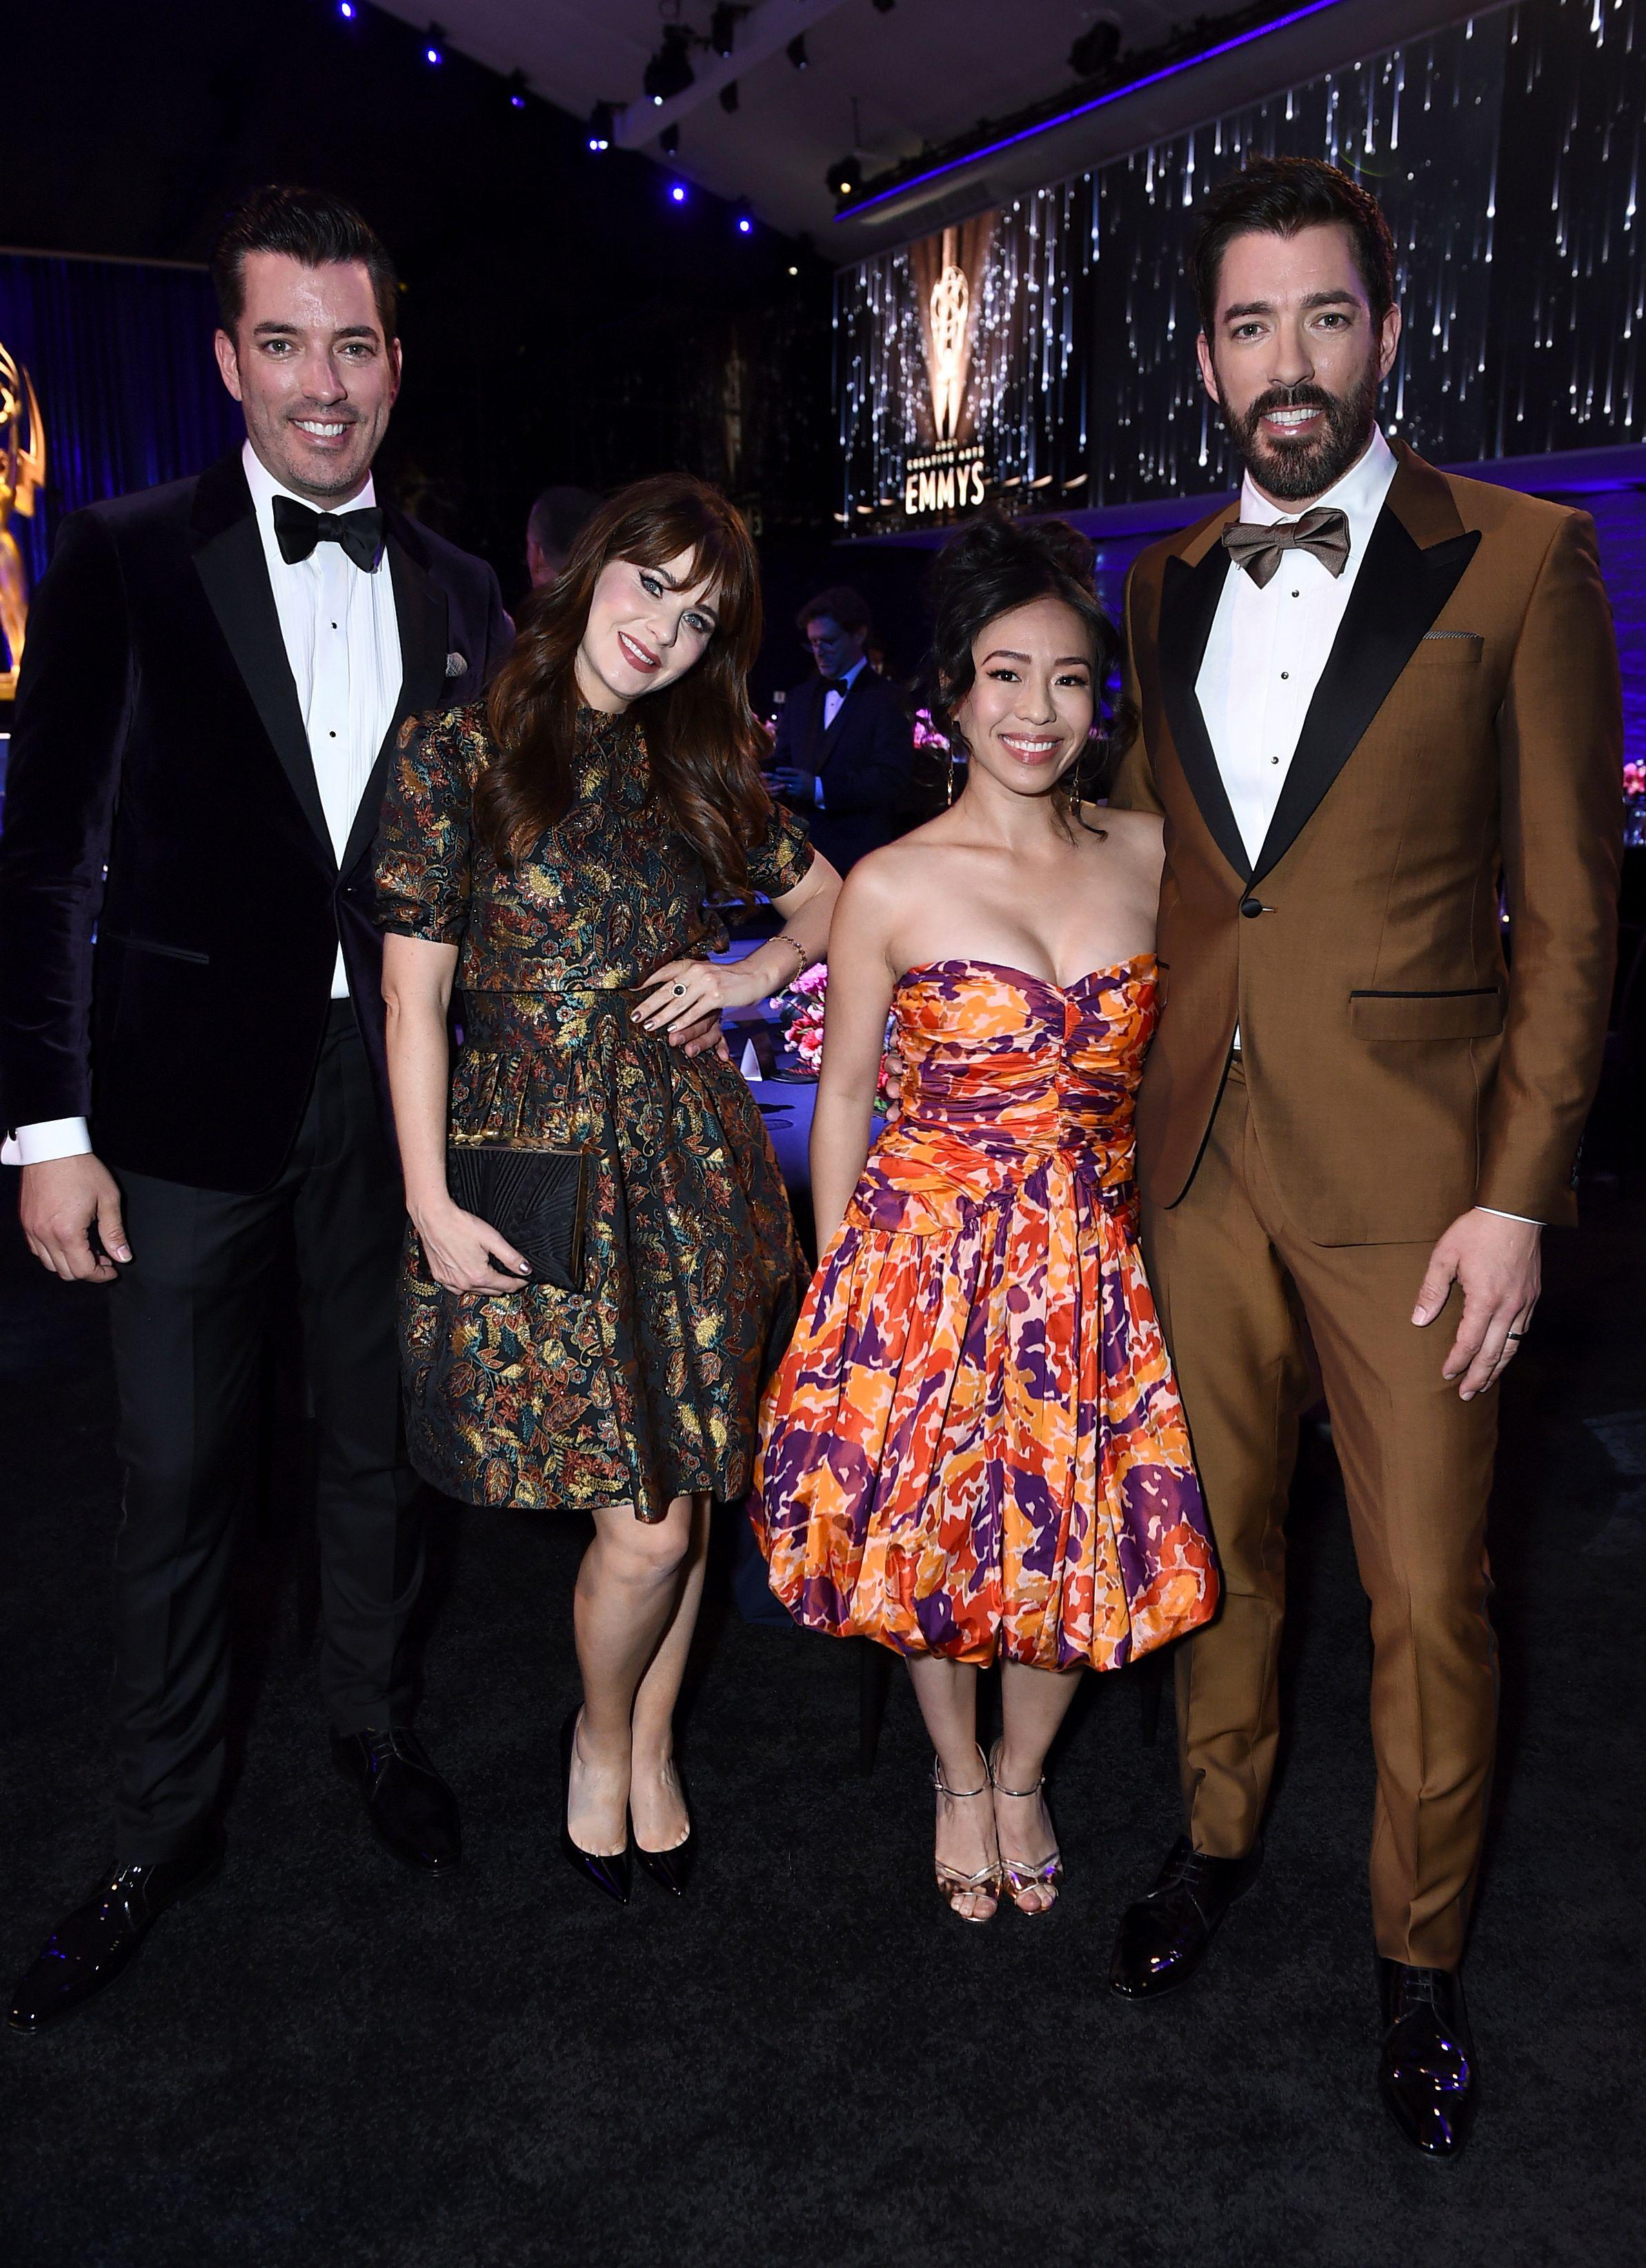 Jonathan Scott, Zooey Deschanel, Linda Phan, Drew Scott, Creative Arts Emmy Awards